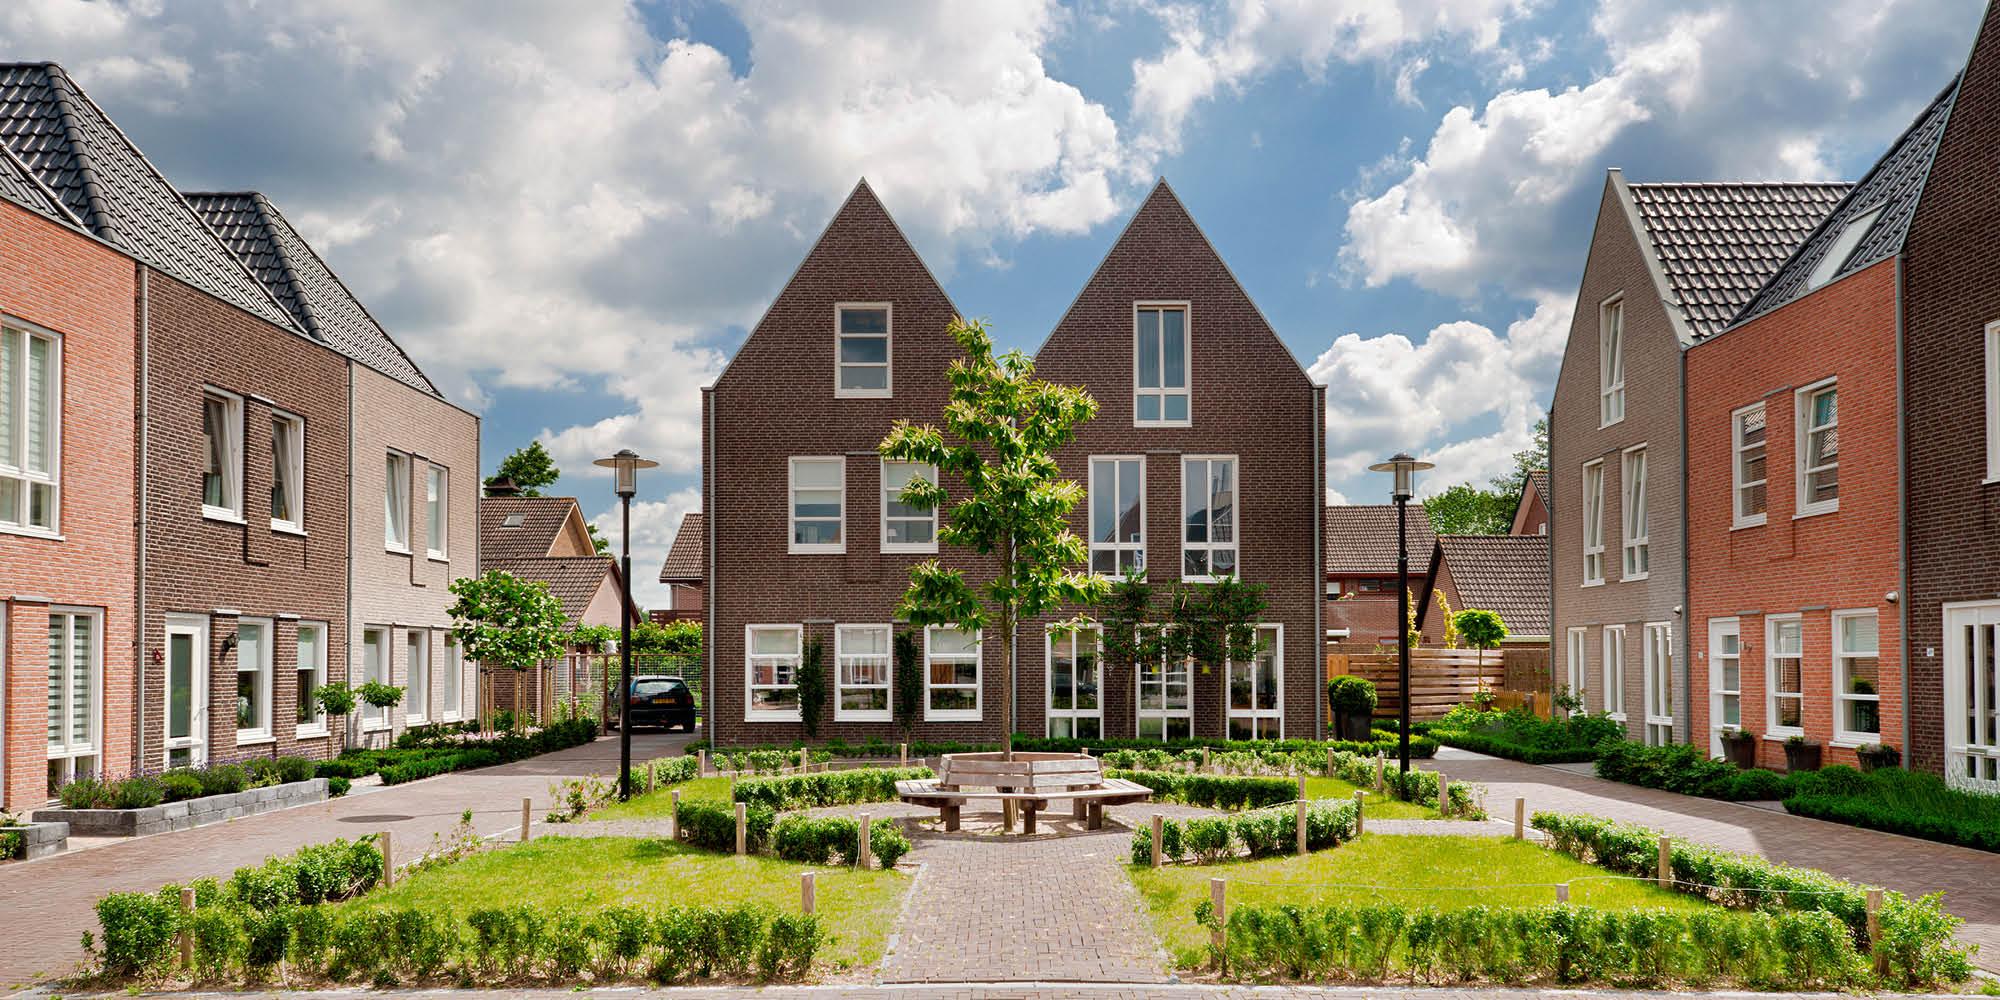 151-Leesonhof-Ederveen3